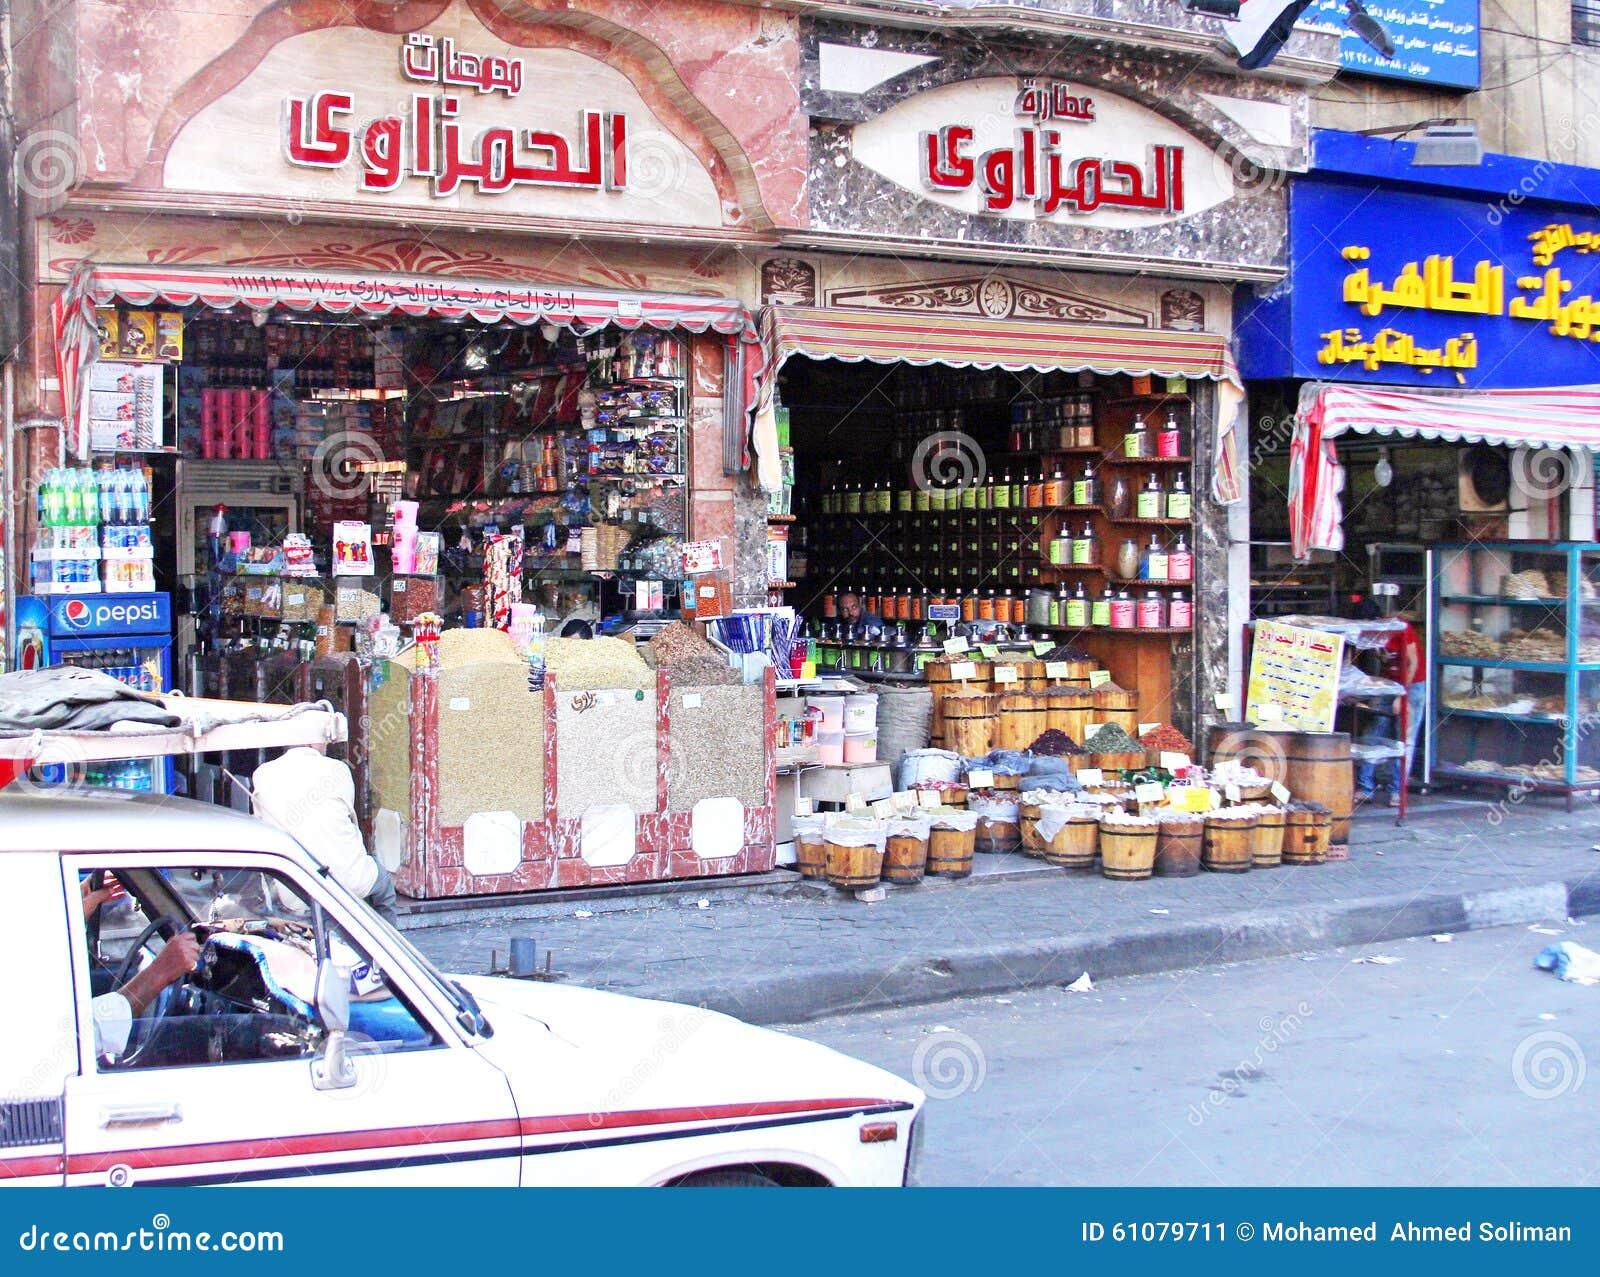 Egypt cairo street view editorial photo image 61079711 Cairo shop